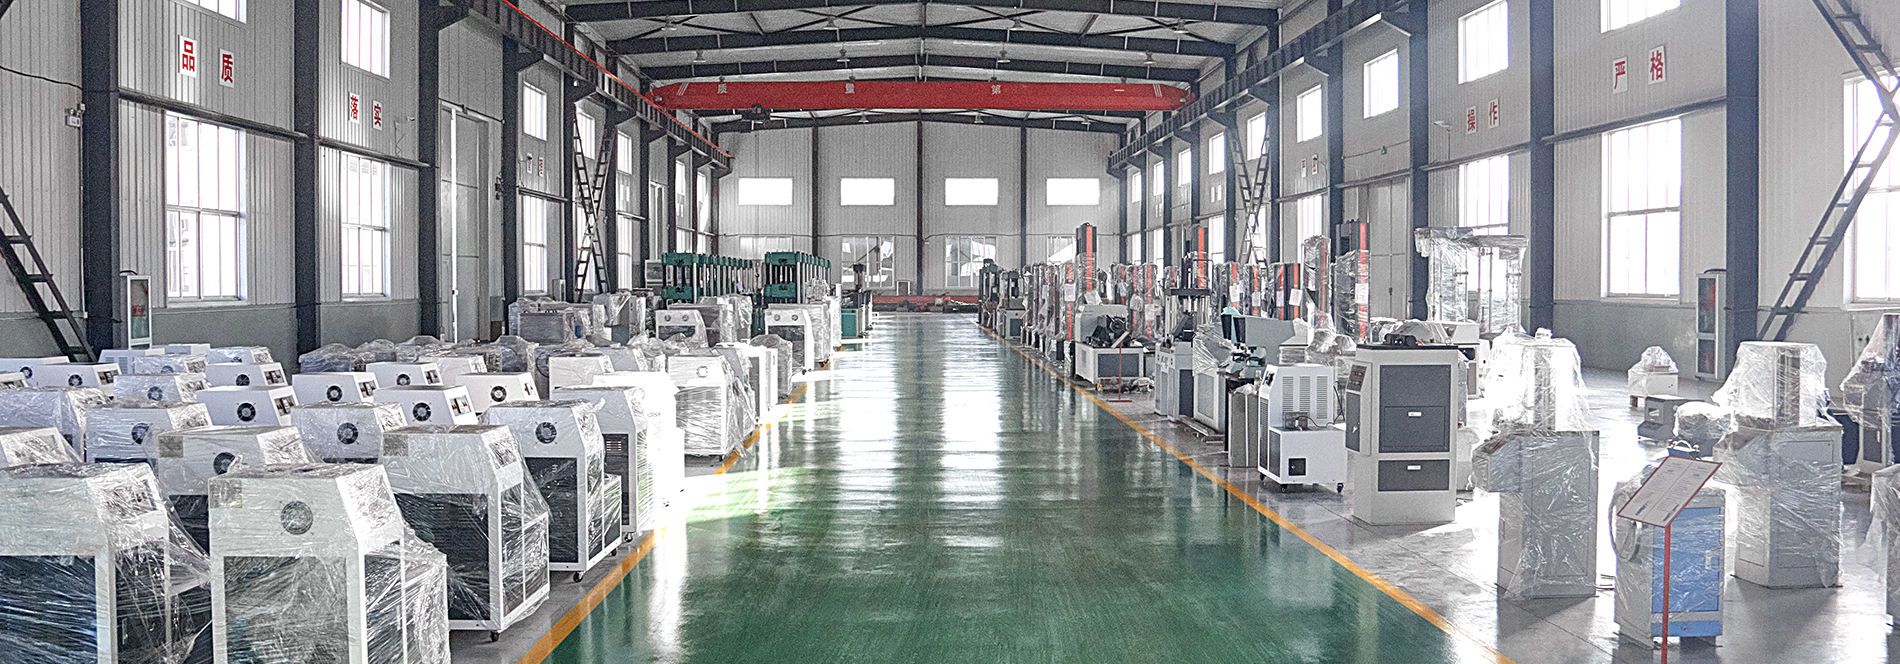 Завод Liangong общий вид склада оборудования